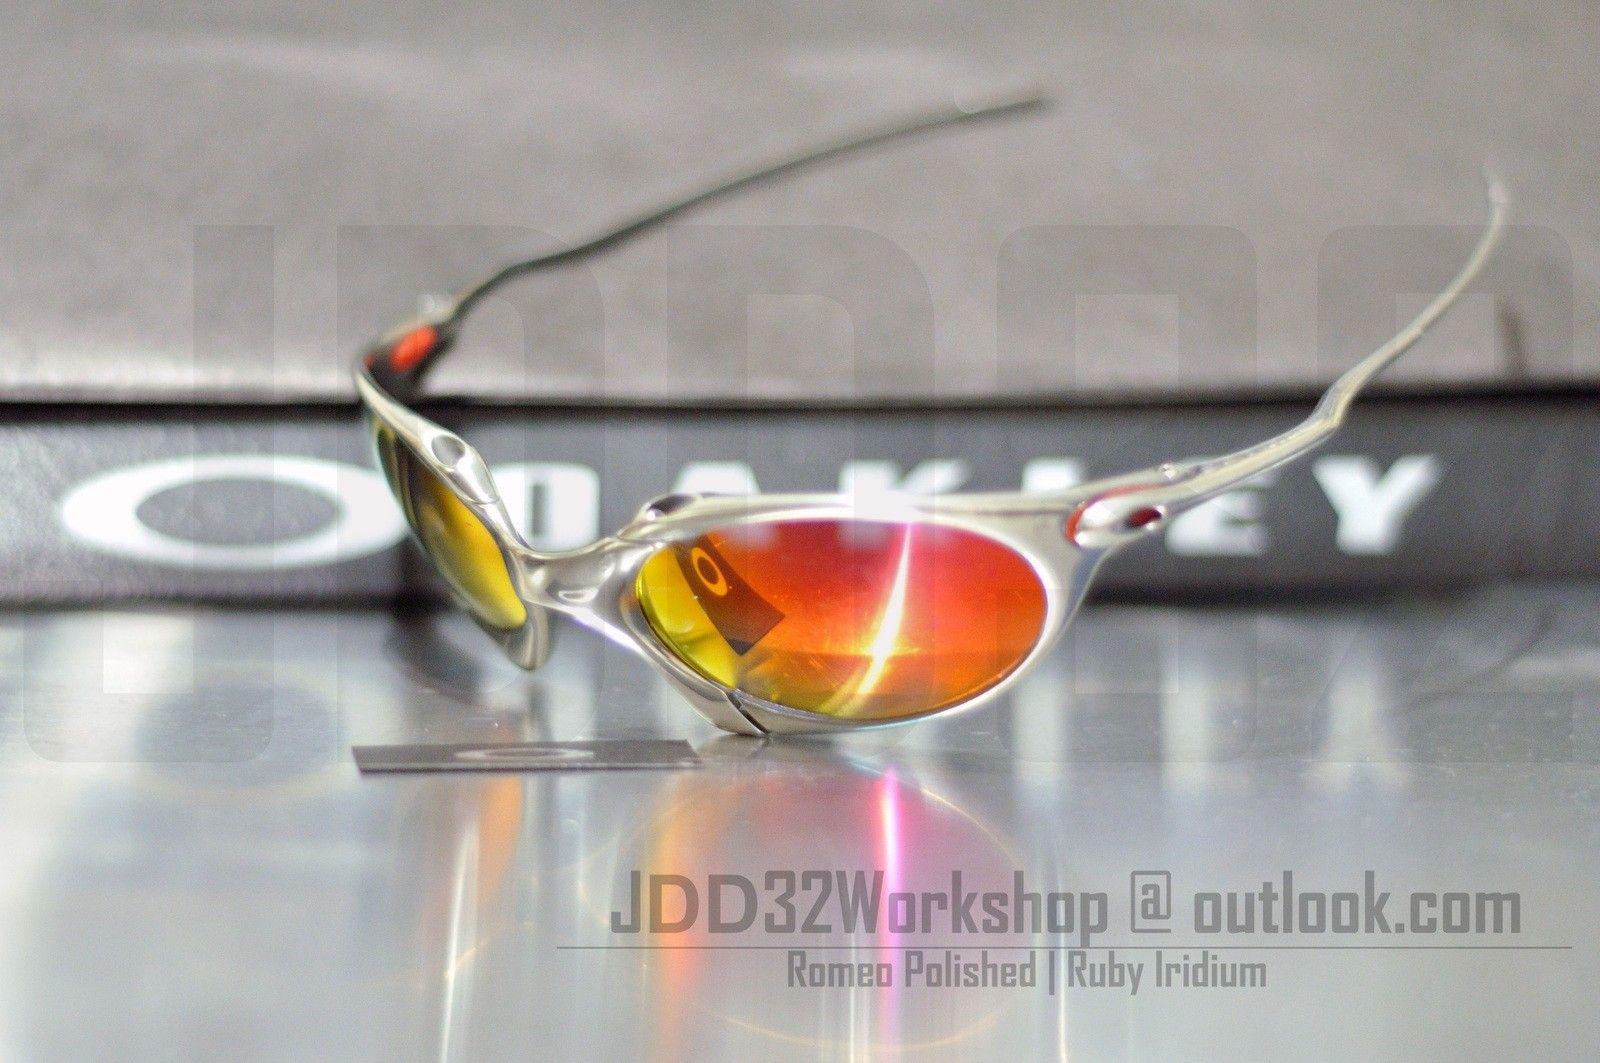 Oakley Juliet Fire Iridium: Choosing Frame - DSC_1350 copy.jpg